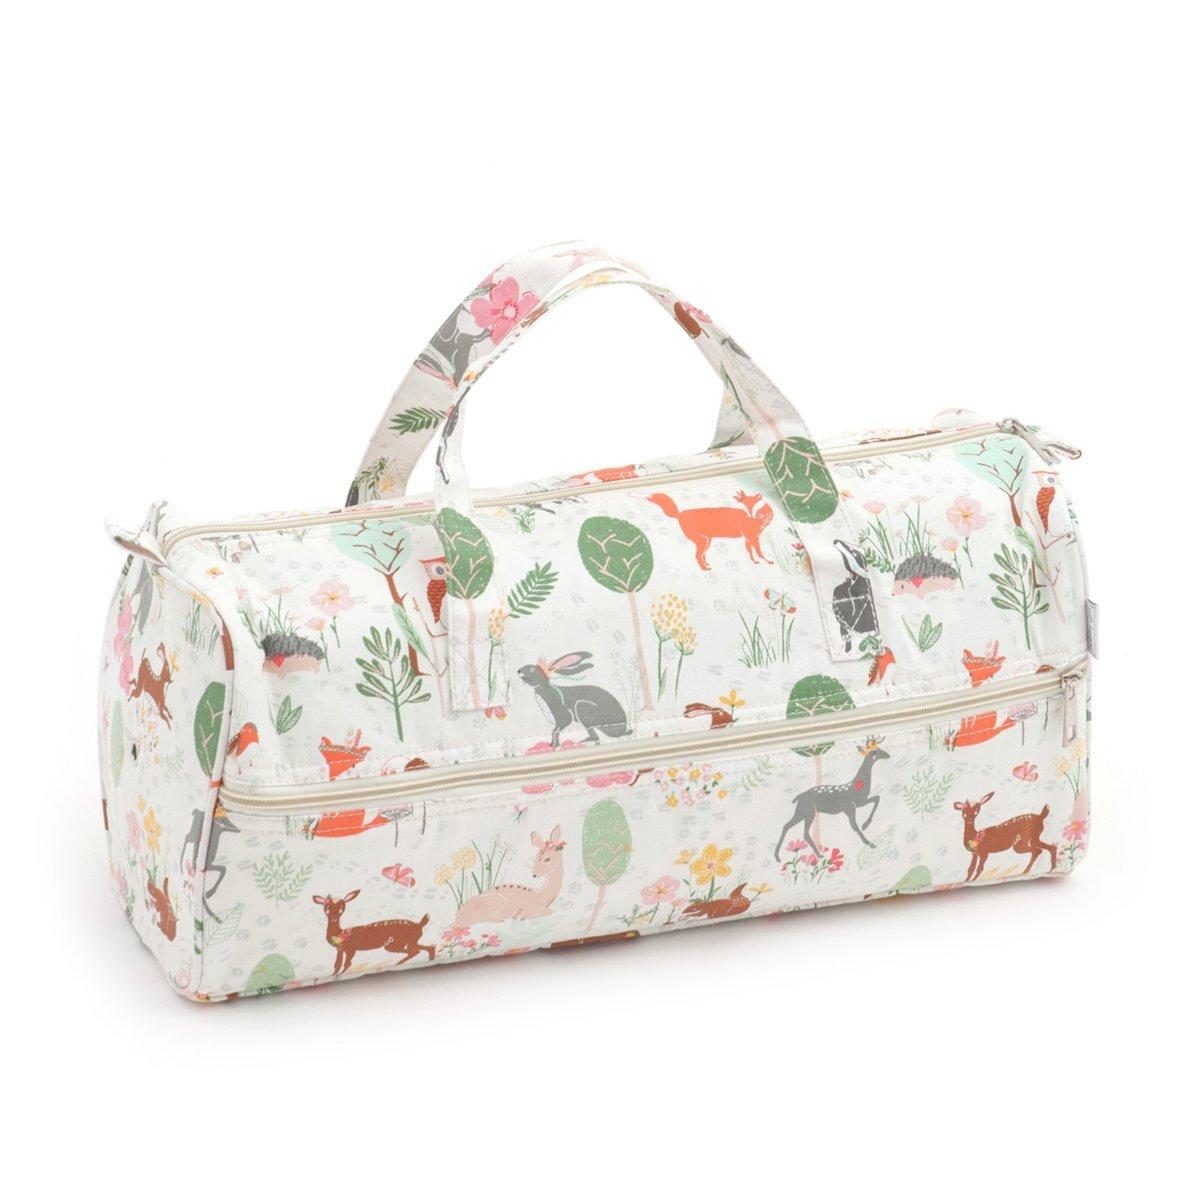 Matching Set - Knitting Bag (fabric handles) & Knitting Pin Soft Case - Woodland Hobbygift